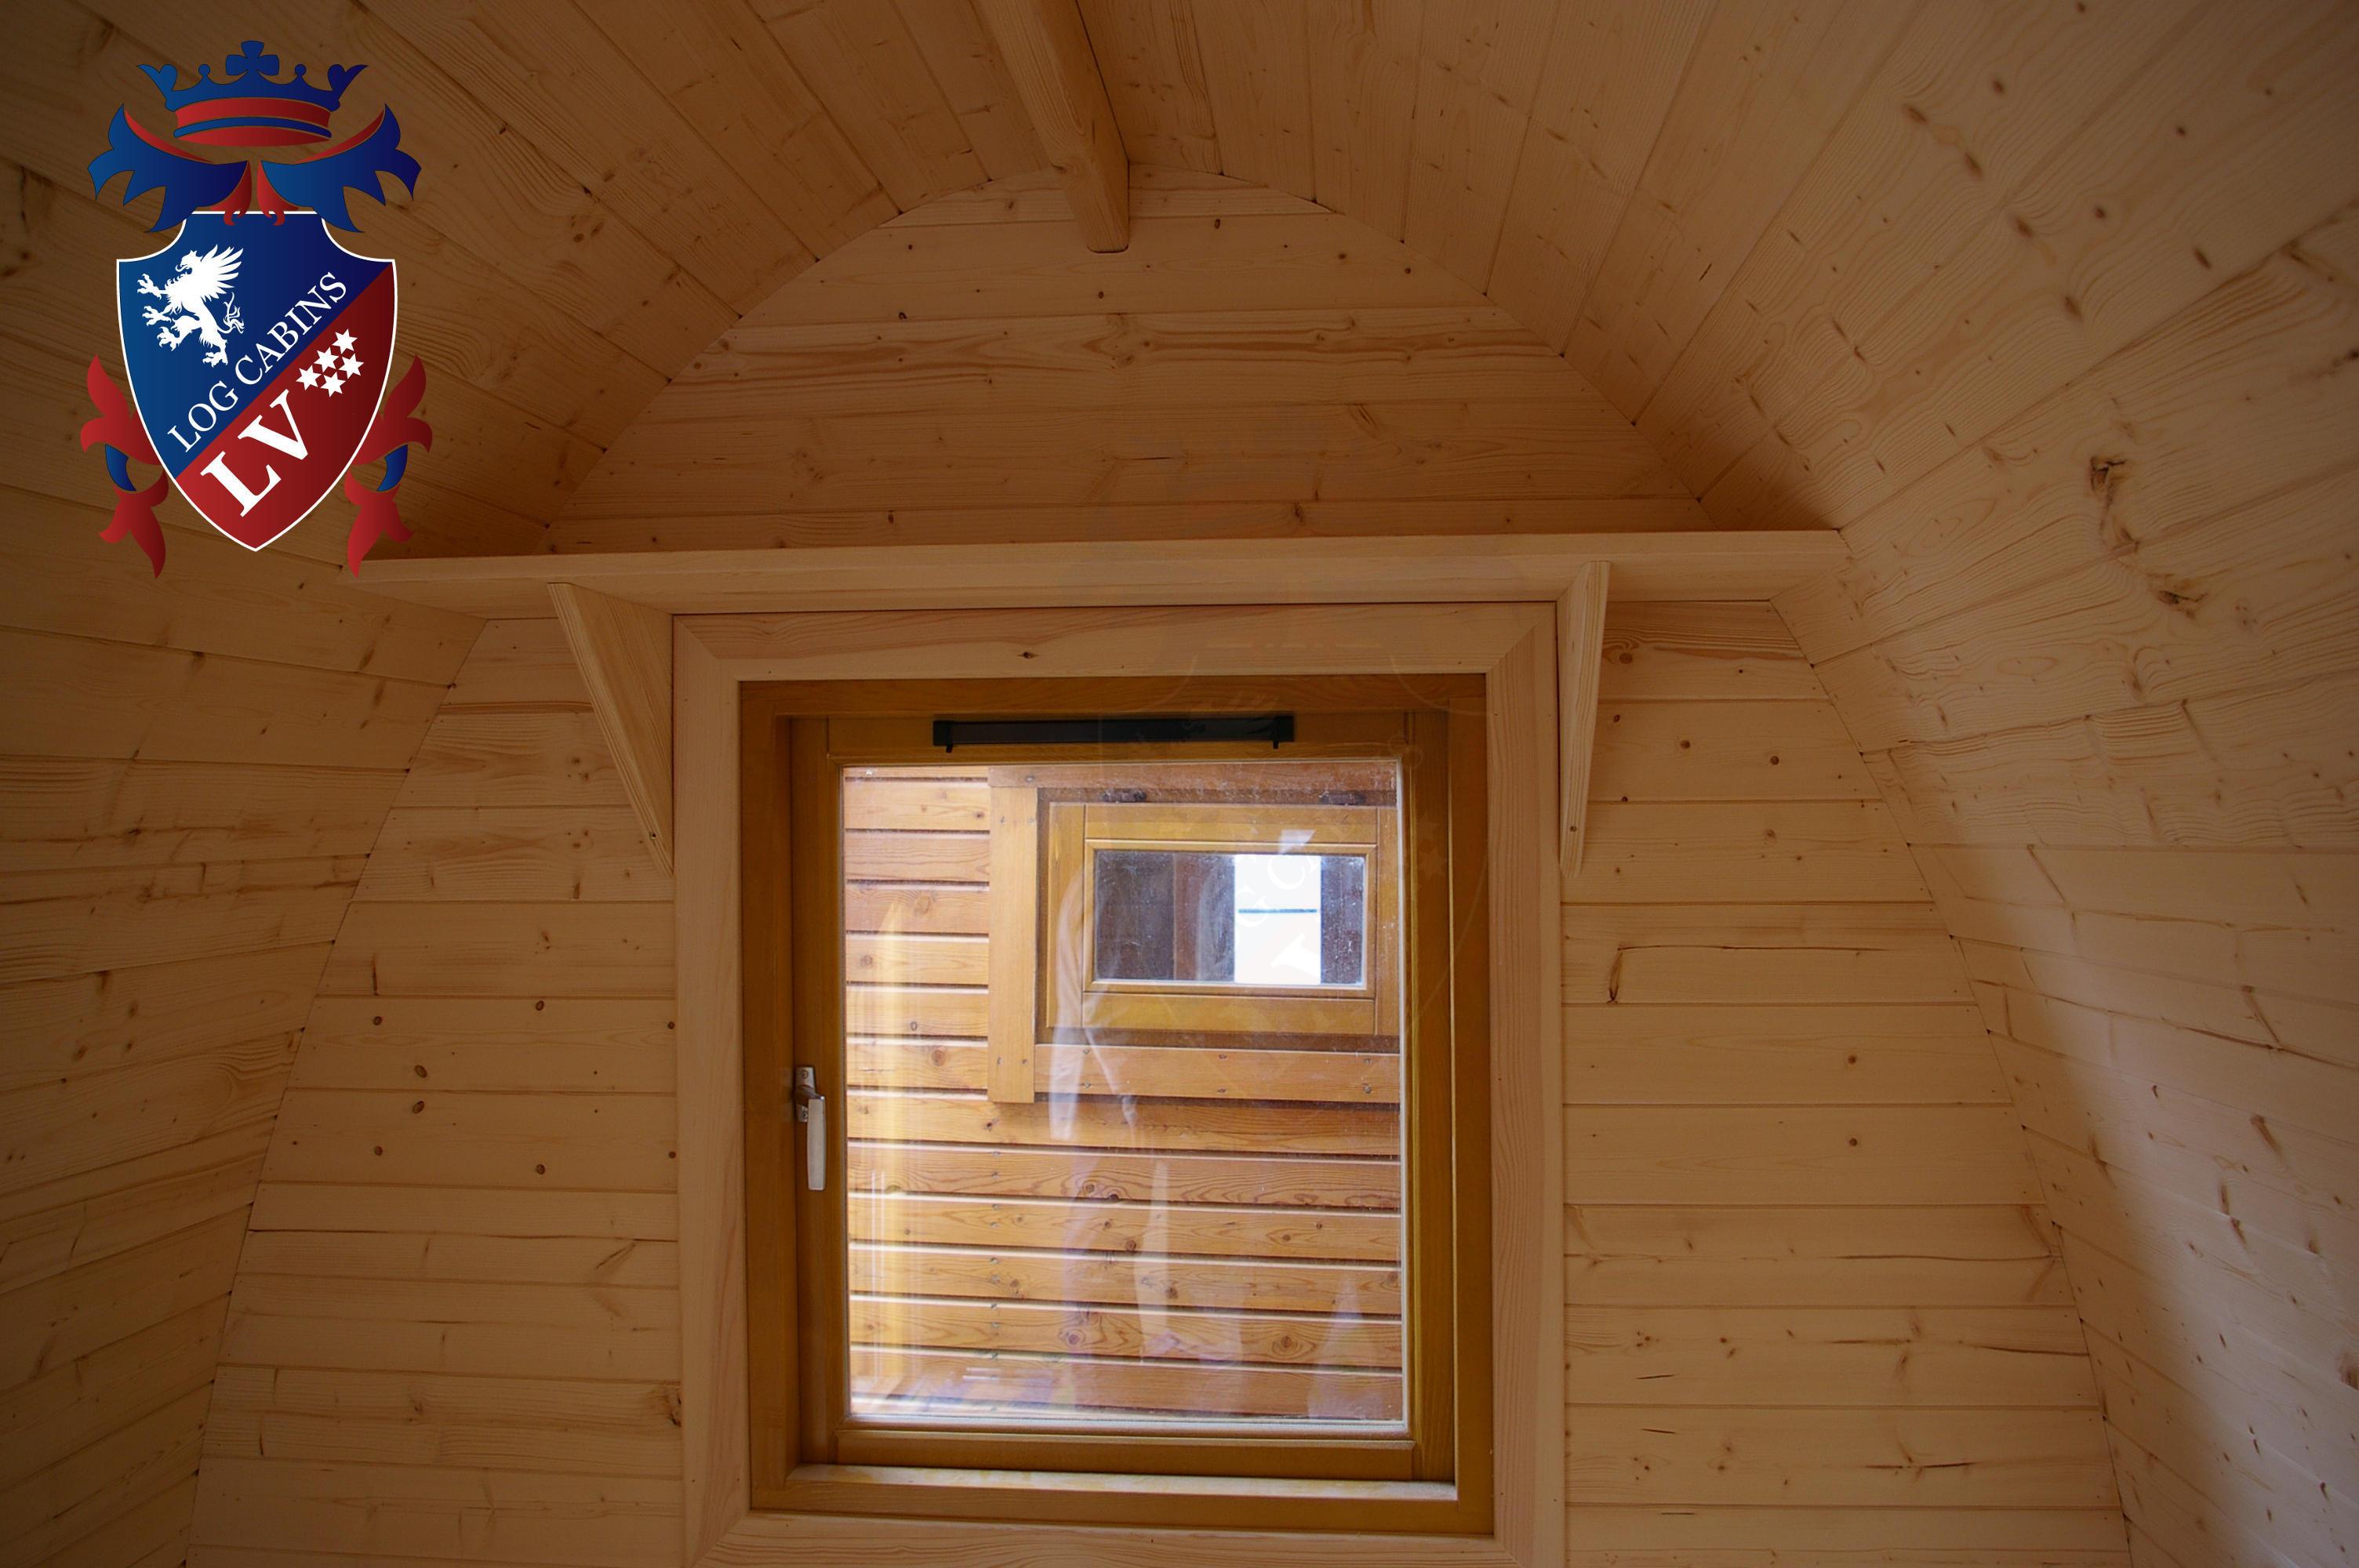 Log Cabins LV  2015  30